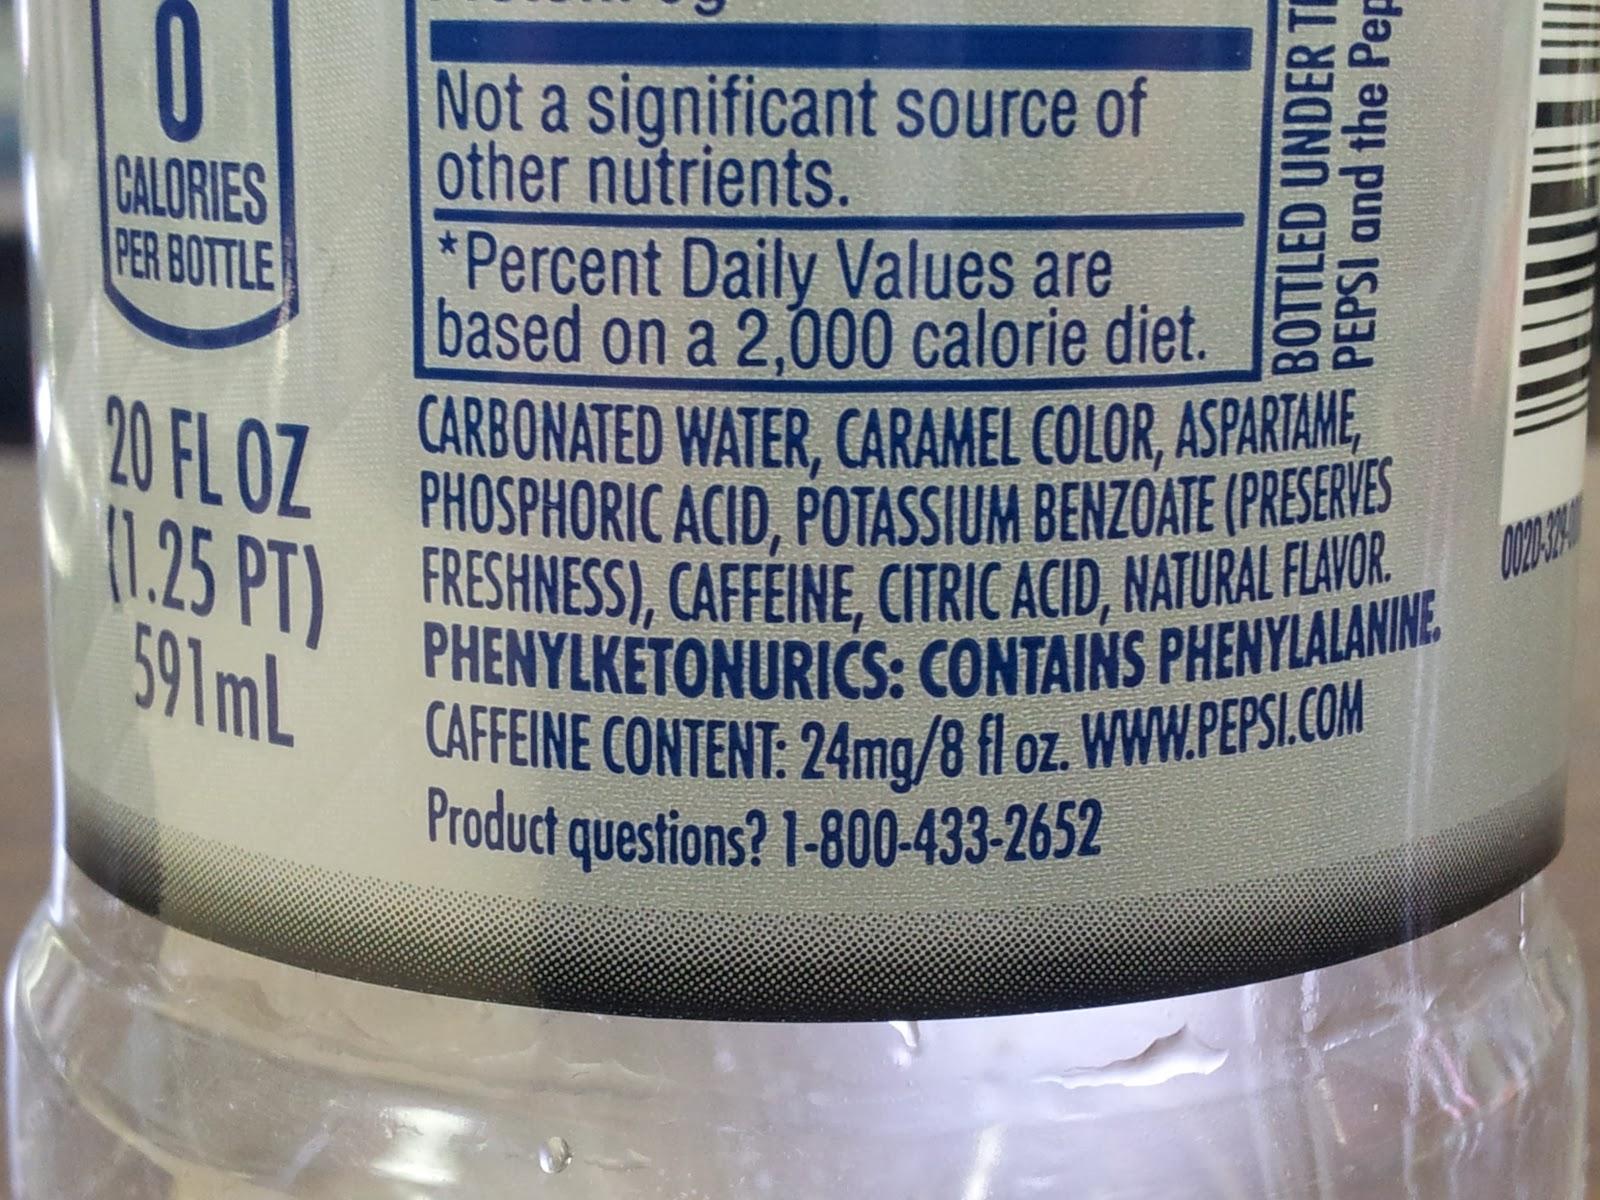 Diet Pepsi Ingre Nts Label